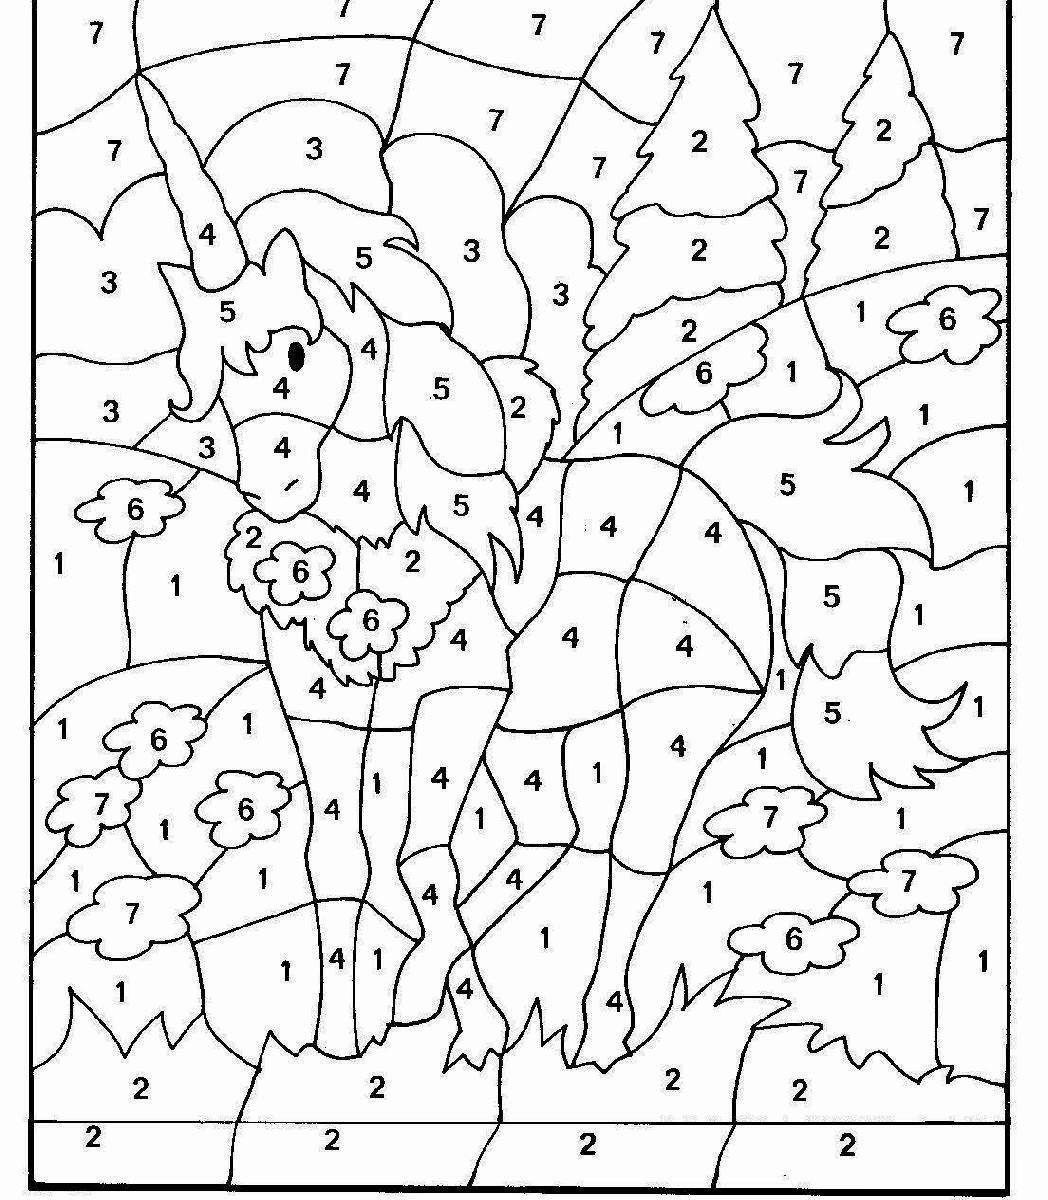 Coloring Addition Worksheets For Grade 1 Colouring Mermaid Math Coloring Worksheets Math Coloring Christmas Math Worksheets